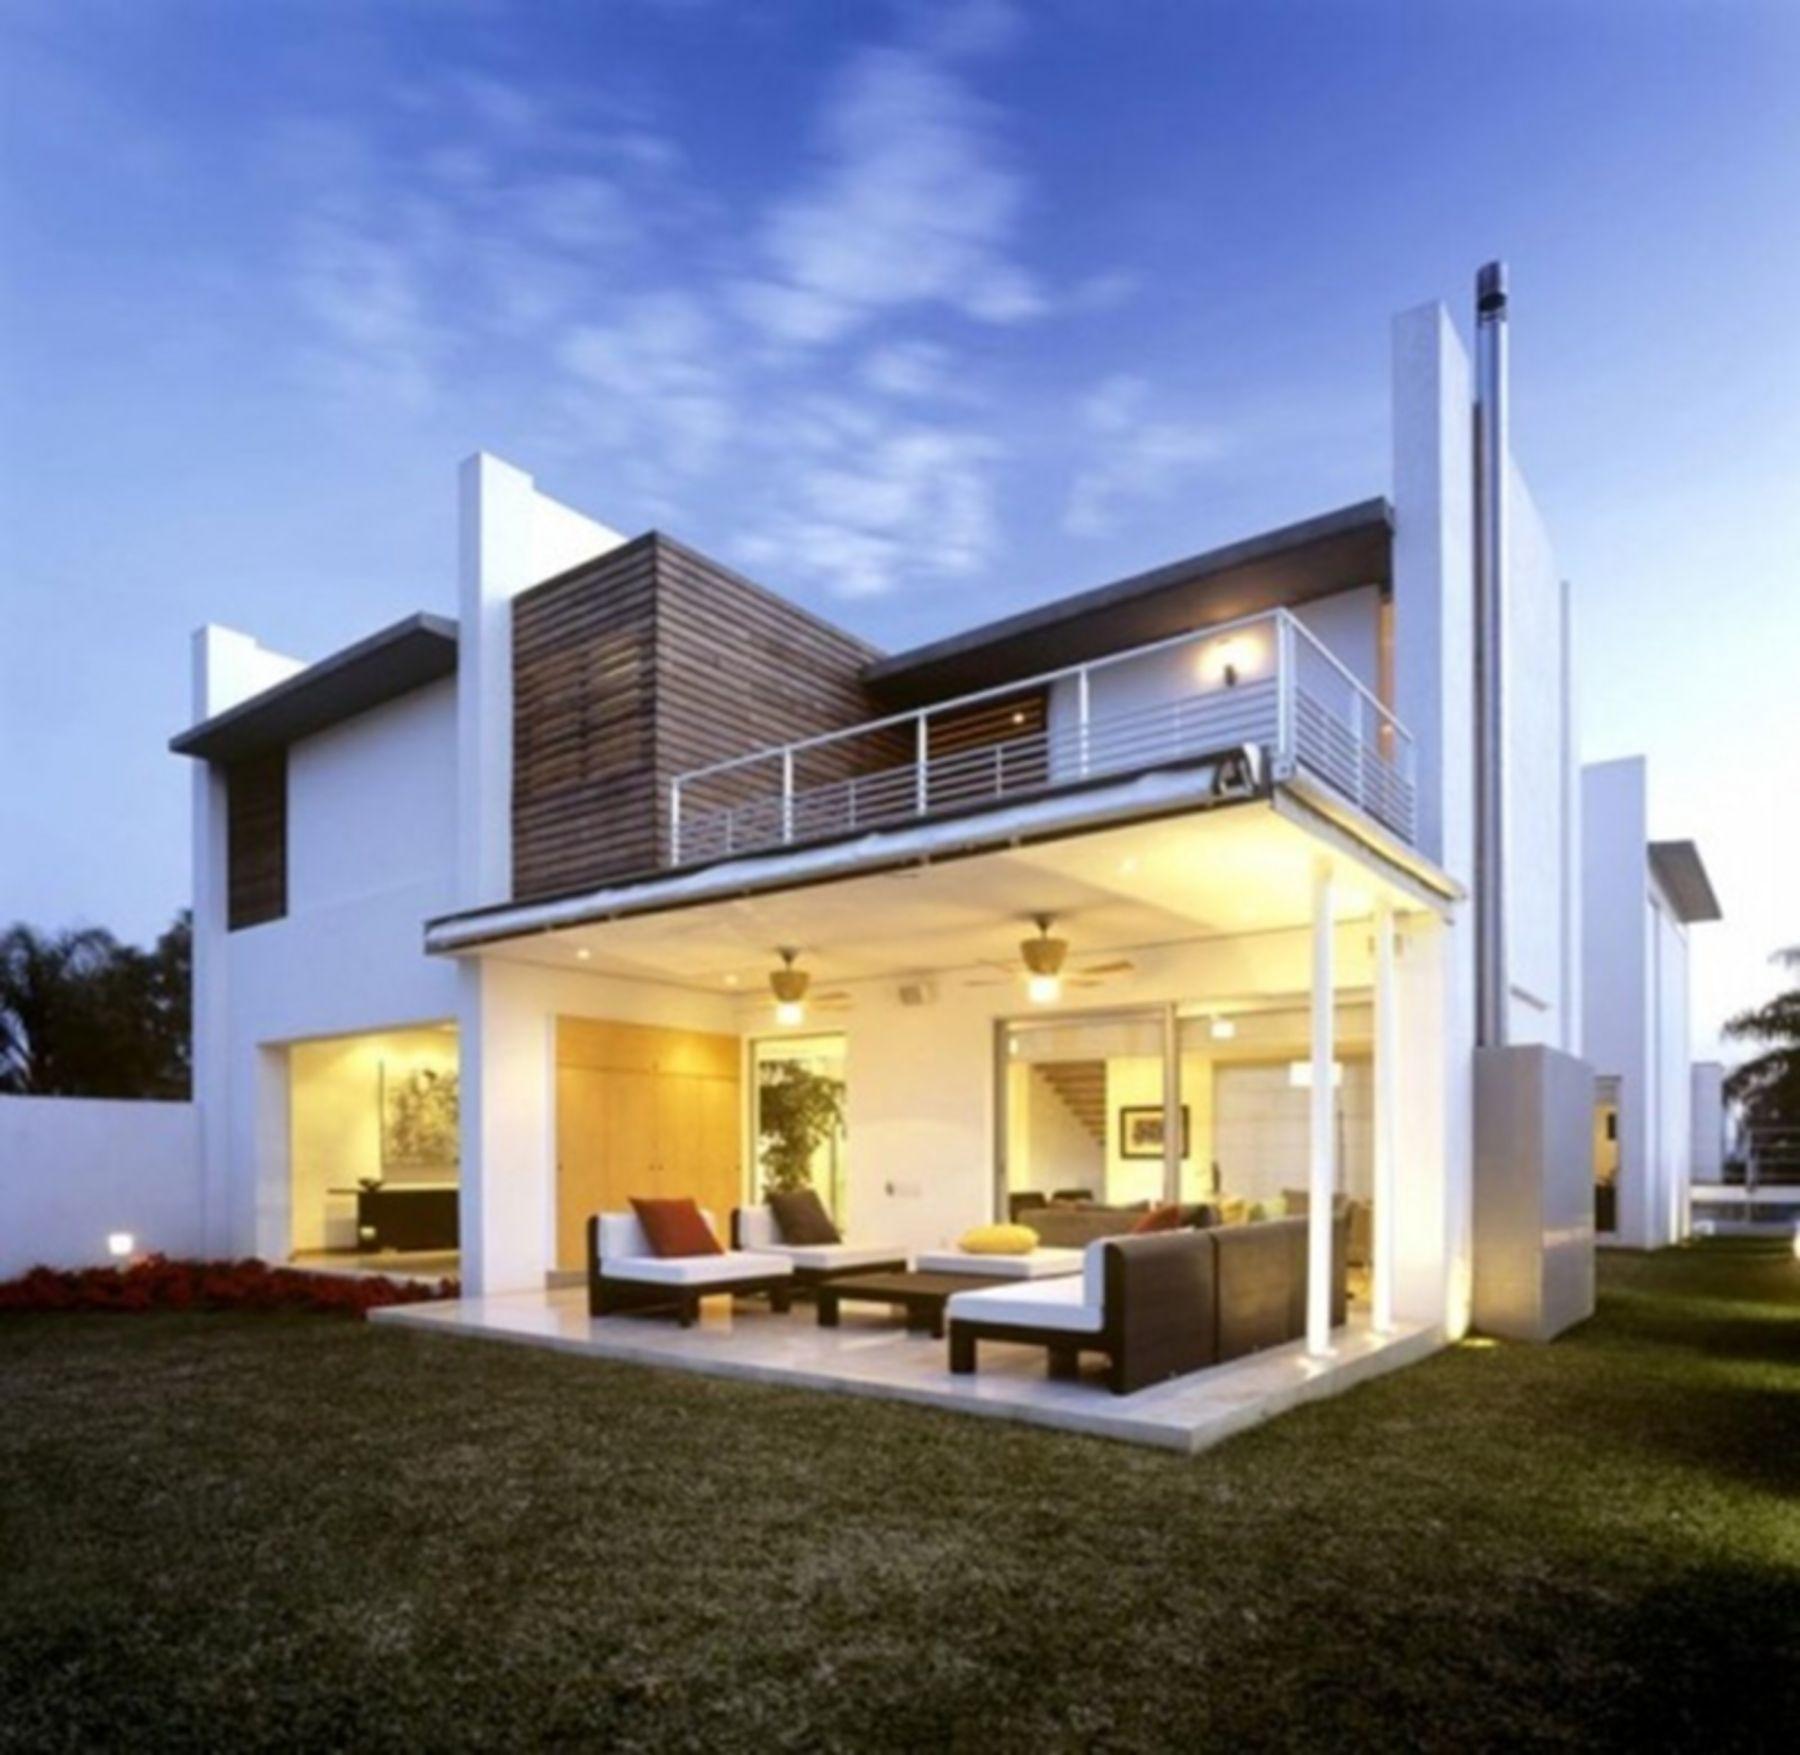 25 Modern Minimalist House Design Ideas For Inspirations Minimalist House Design Modern Minimalist House Modern House Exterior